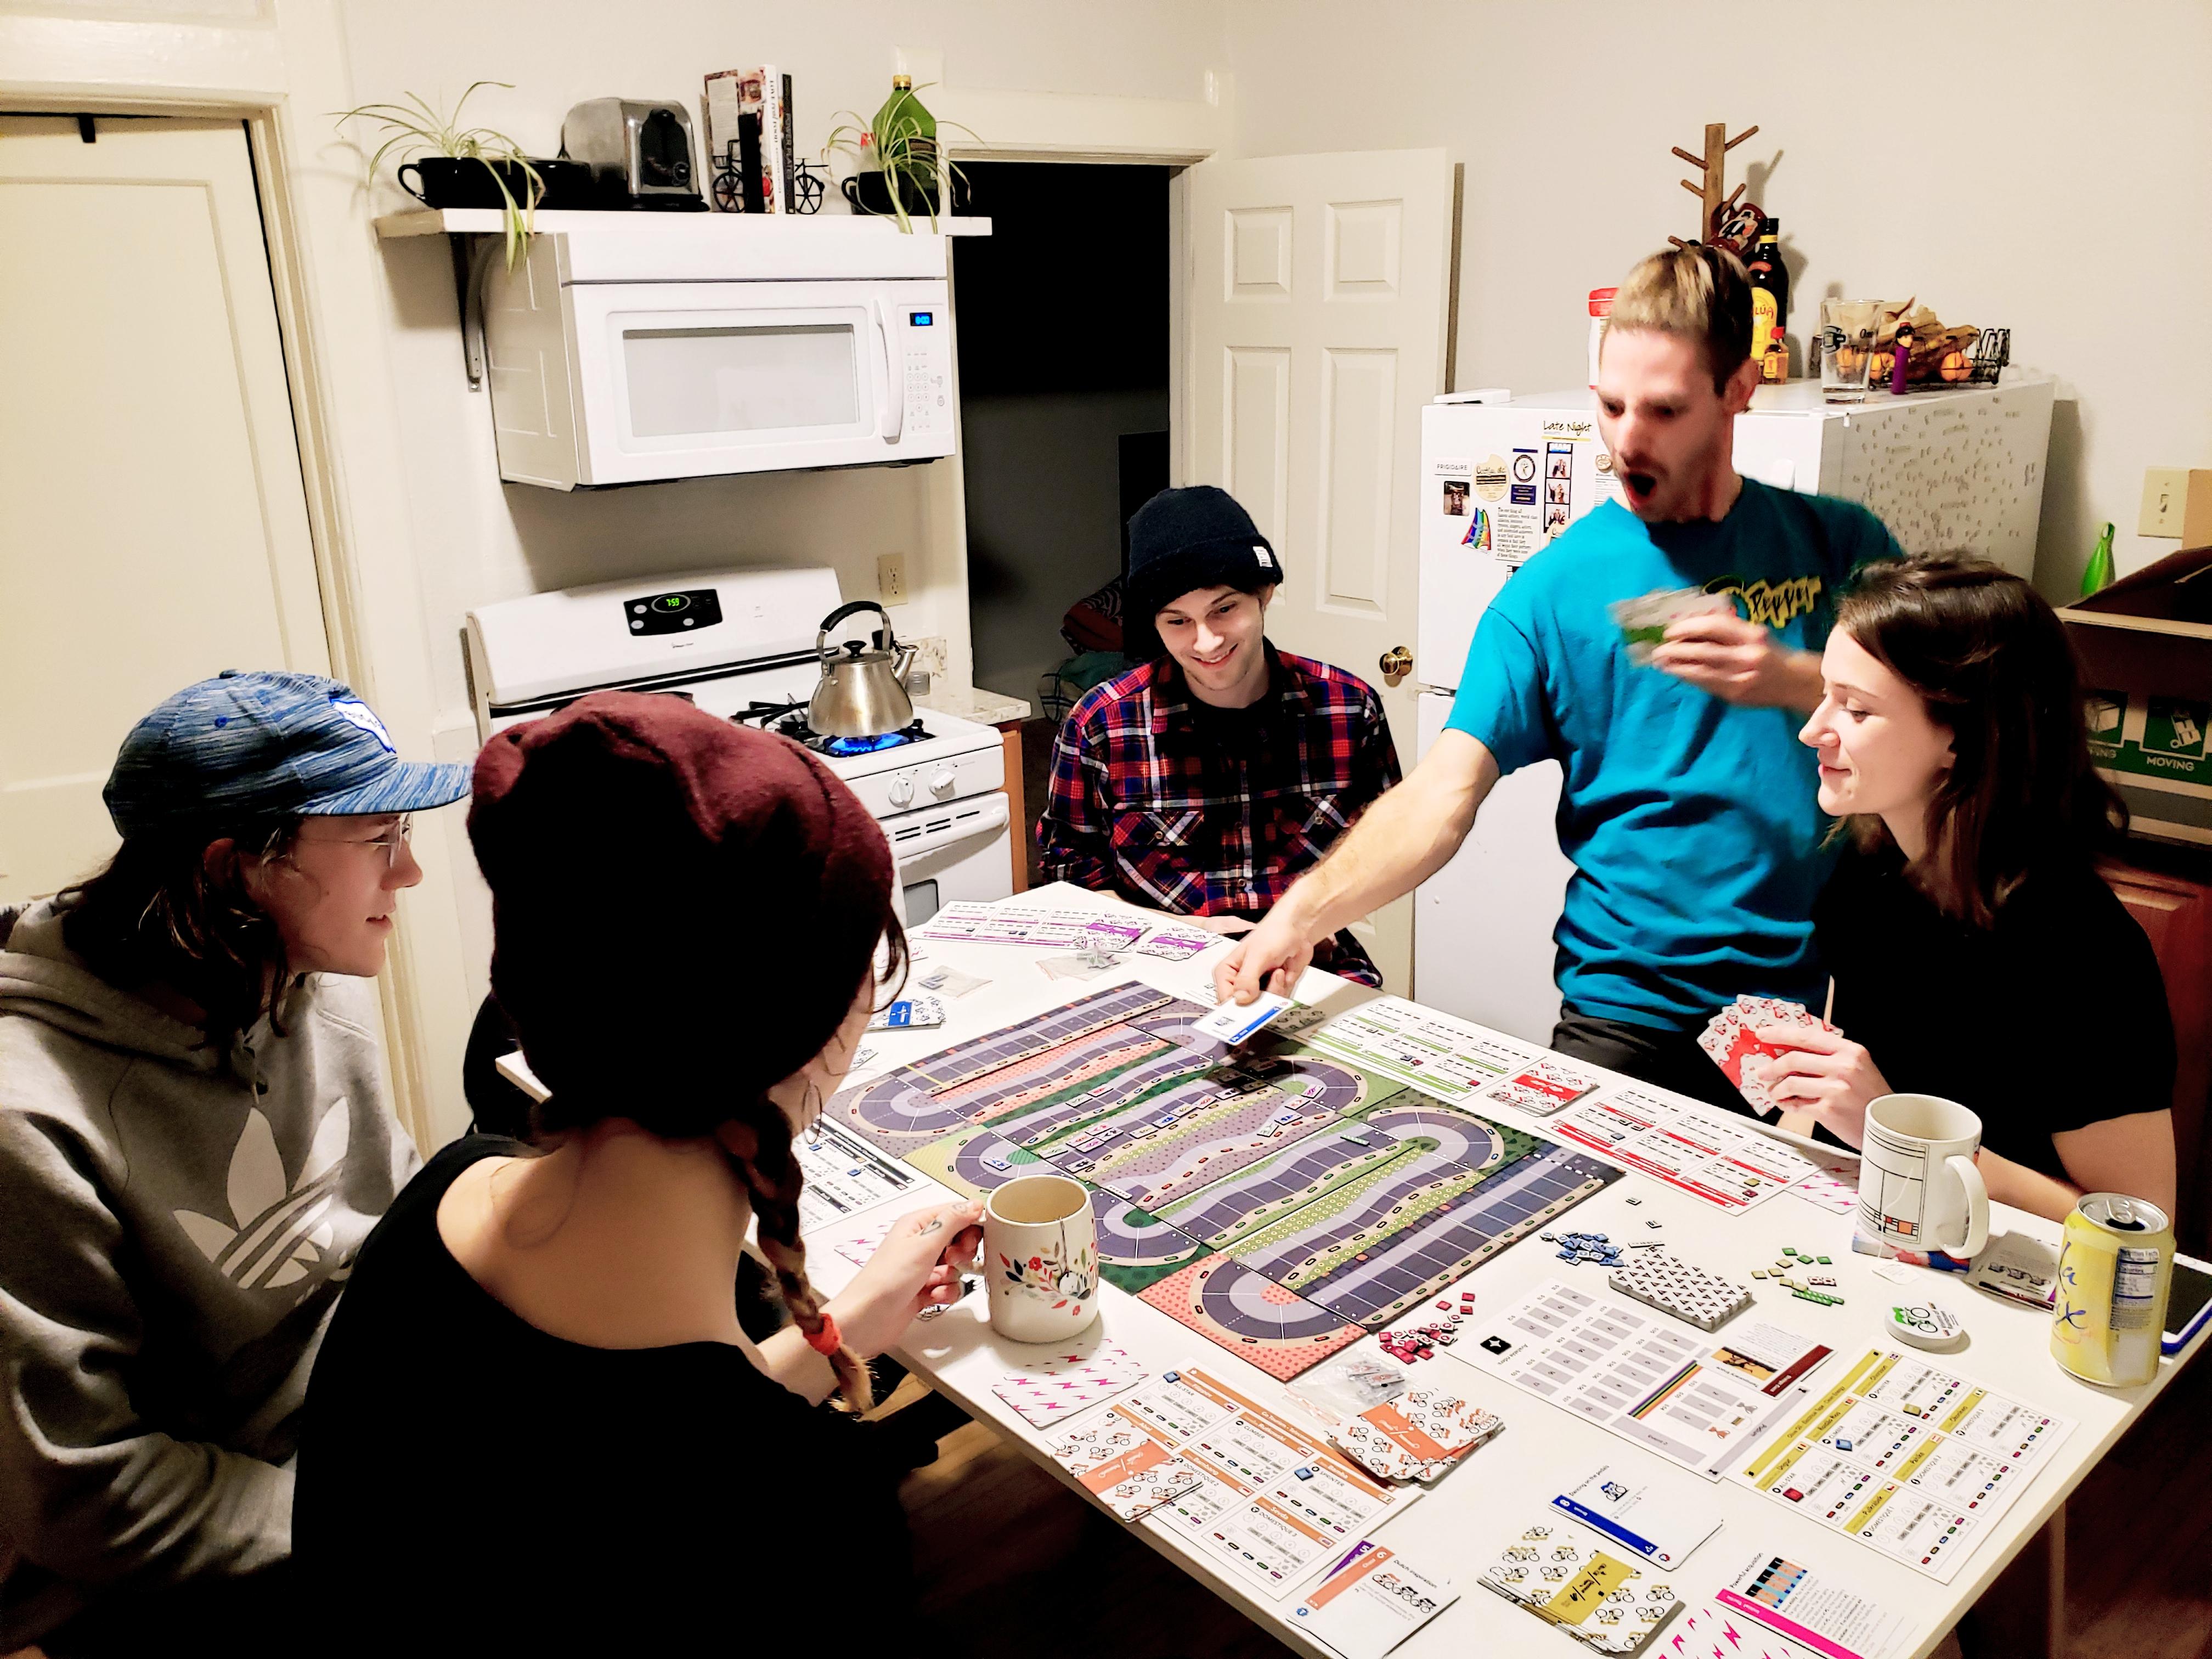 Why design a board game?